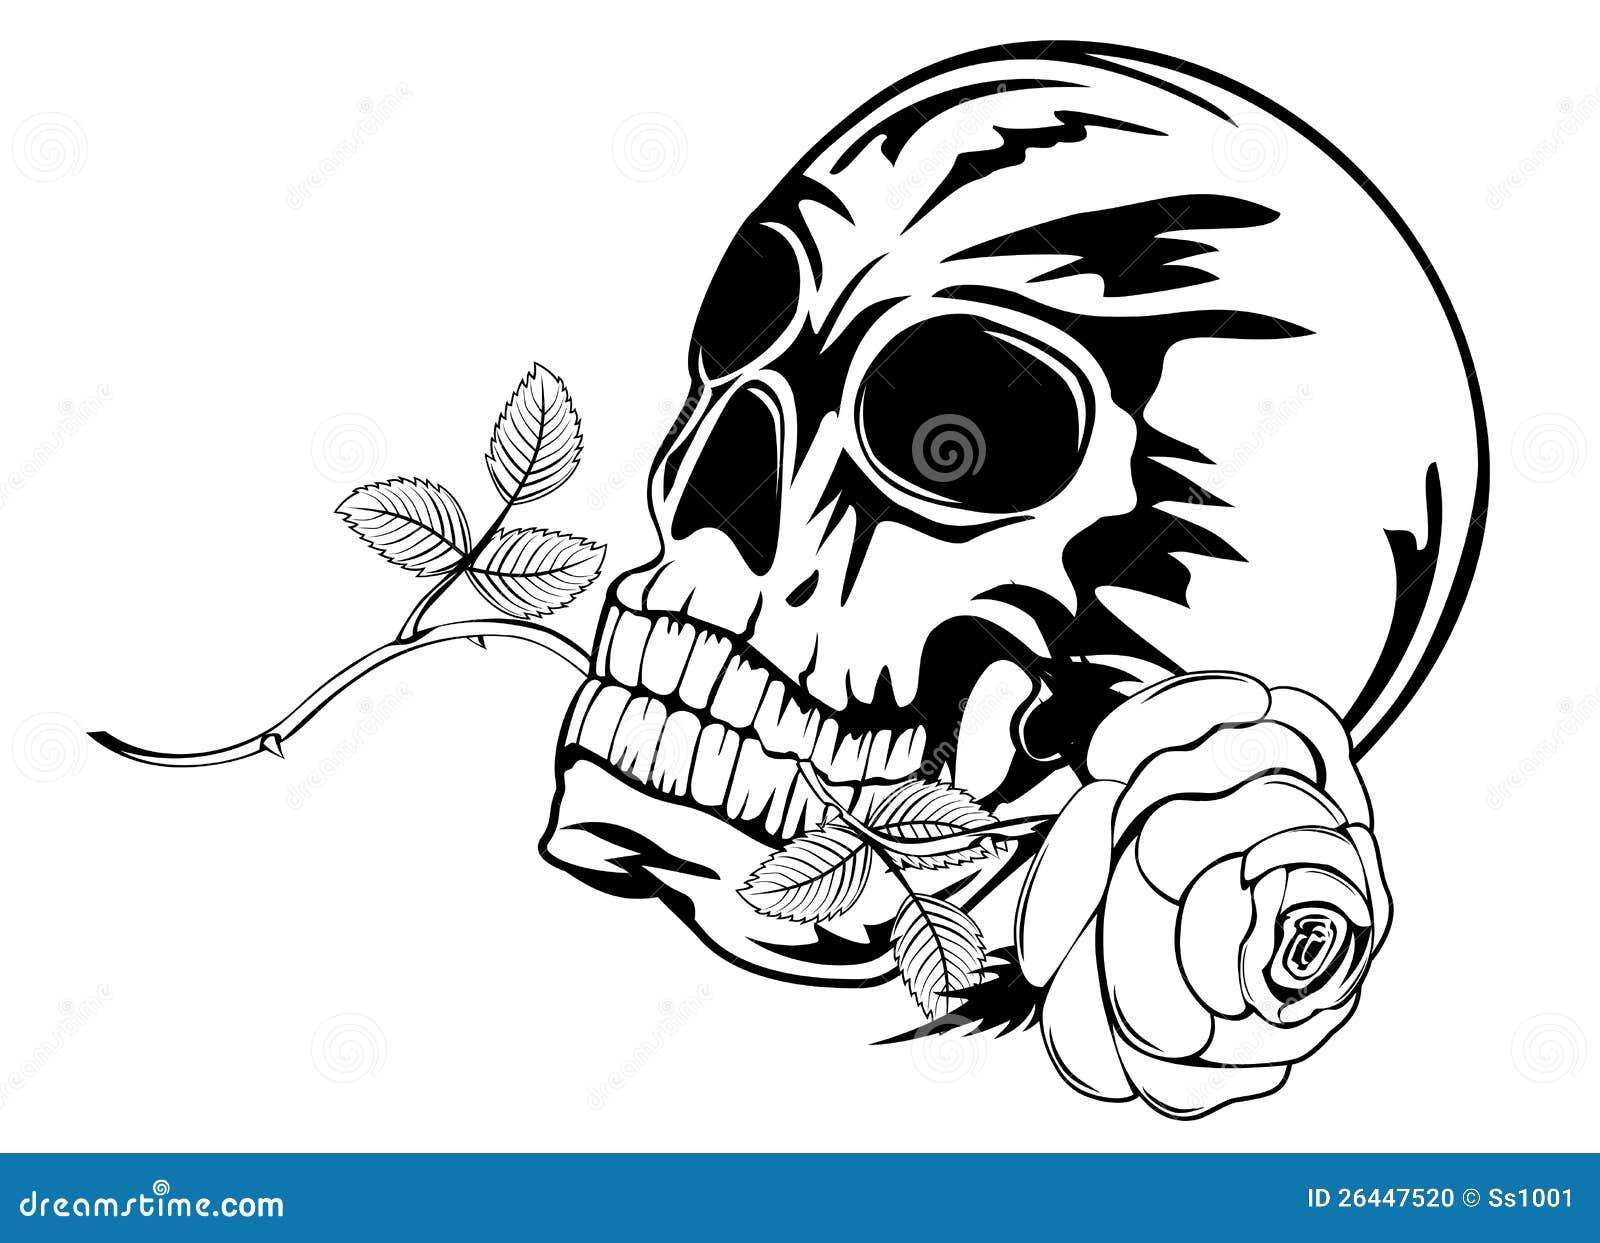 Skull moreover Stock Photo Skull Rose Image26447520 moreover Black And White Corner Floral Rose Vine Border Design Element 1356884 moreover Stock Illustration Portrait Cow Vector Drawing Head Image45654323 as well Stock Illustration Owl Isolated Objects White Background Vector Illustration Eps Image44564598. on vintage anatomy illustration